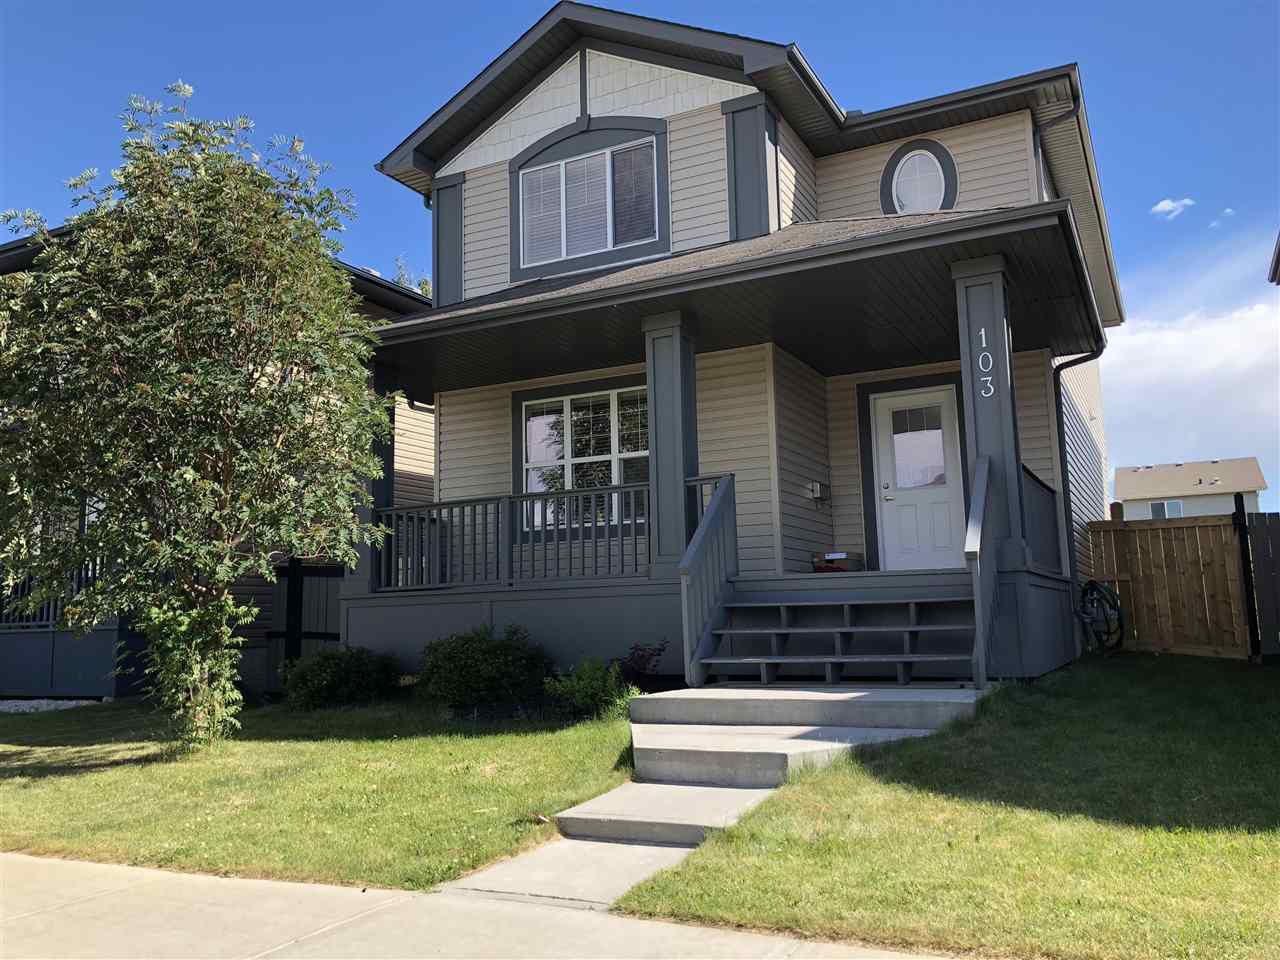 Main Photo: 103 Keystone Lane: Leduc House for sale : MLS®# E4119148